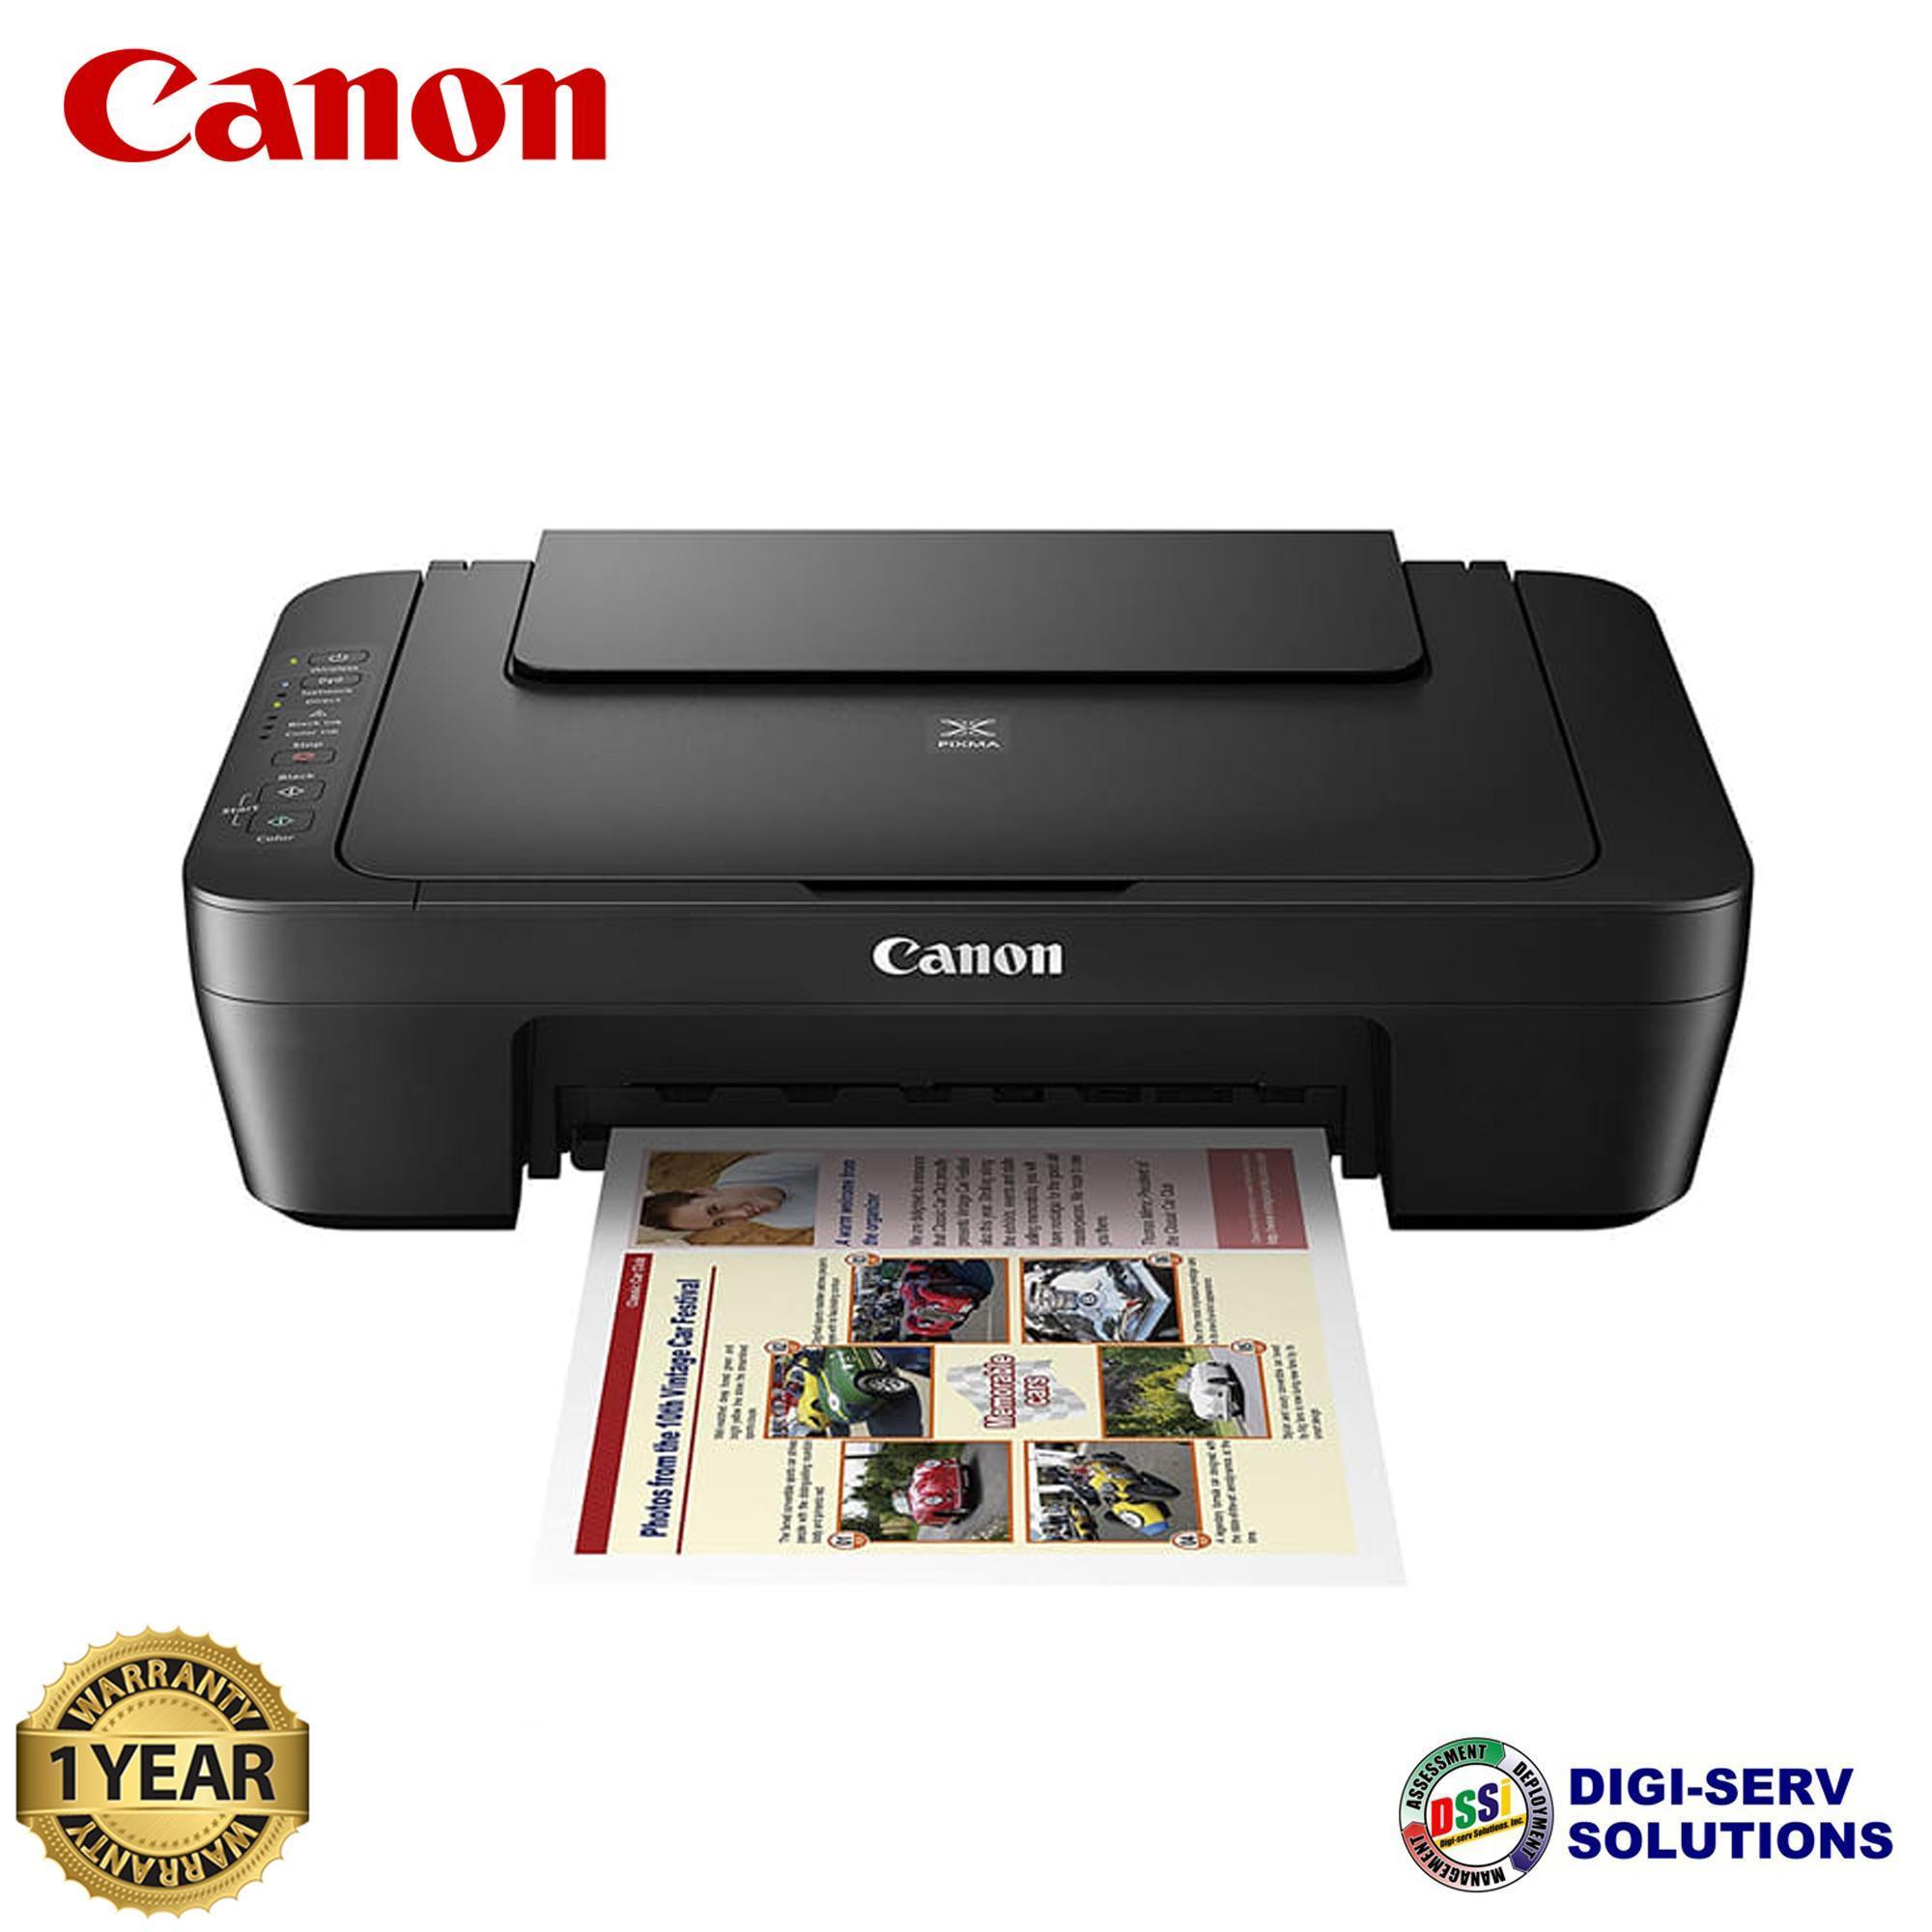 Canon Pixma MG3070S All-in-One Wireless Inkjet Colour Printer (Black)